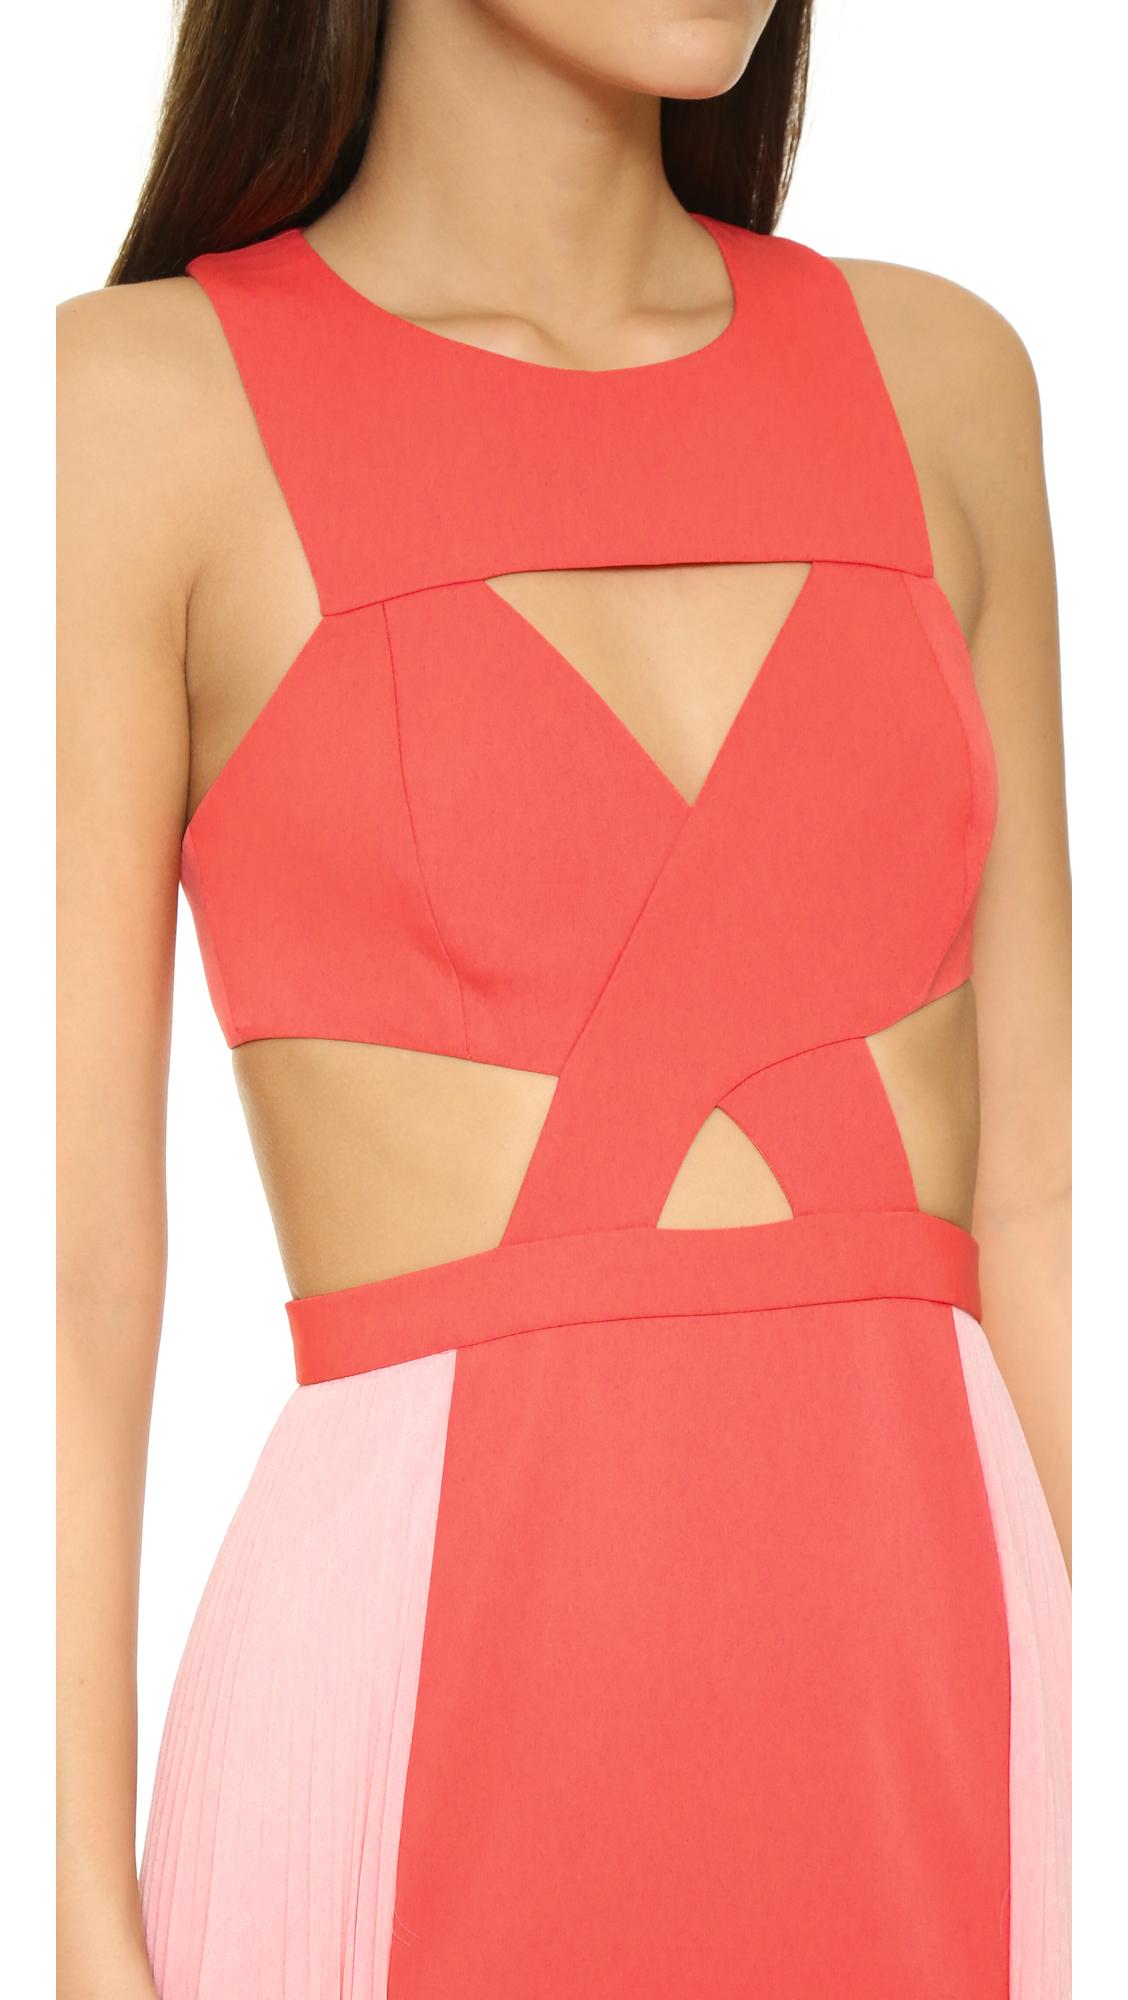 Lyst - Bcbgmaxazria Cutout Gown in Pink